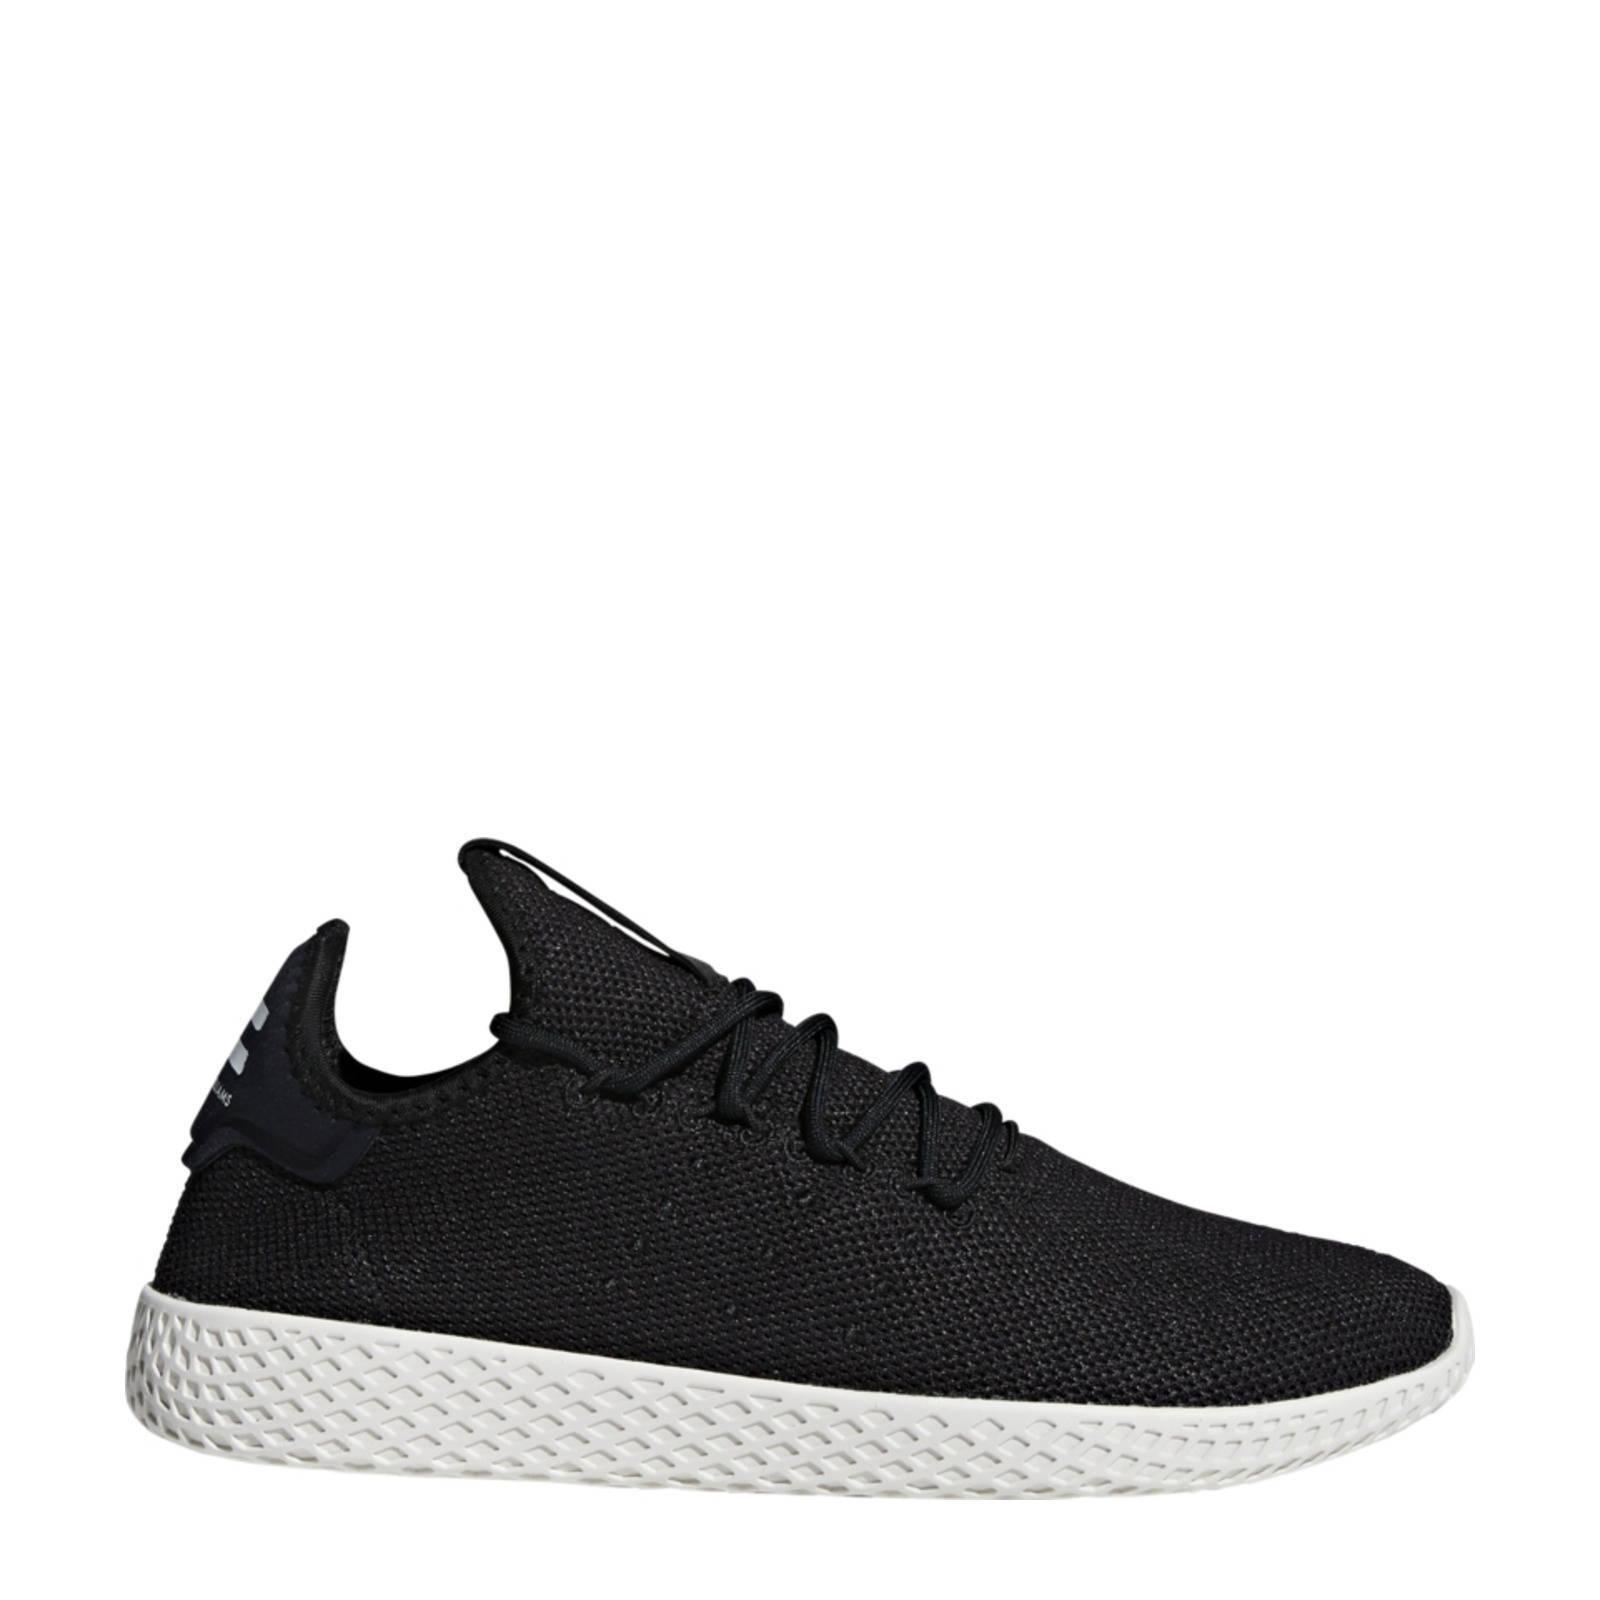 adidas Originals PW TENNIS HU sneakers   wehkamp